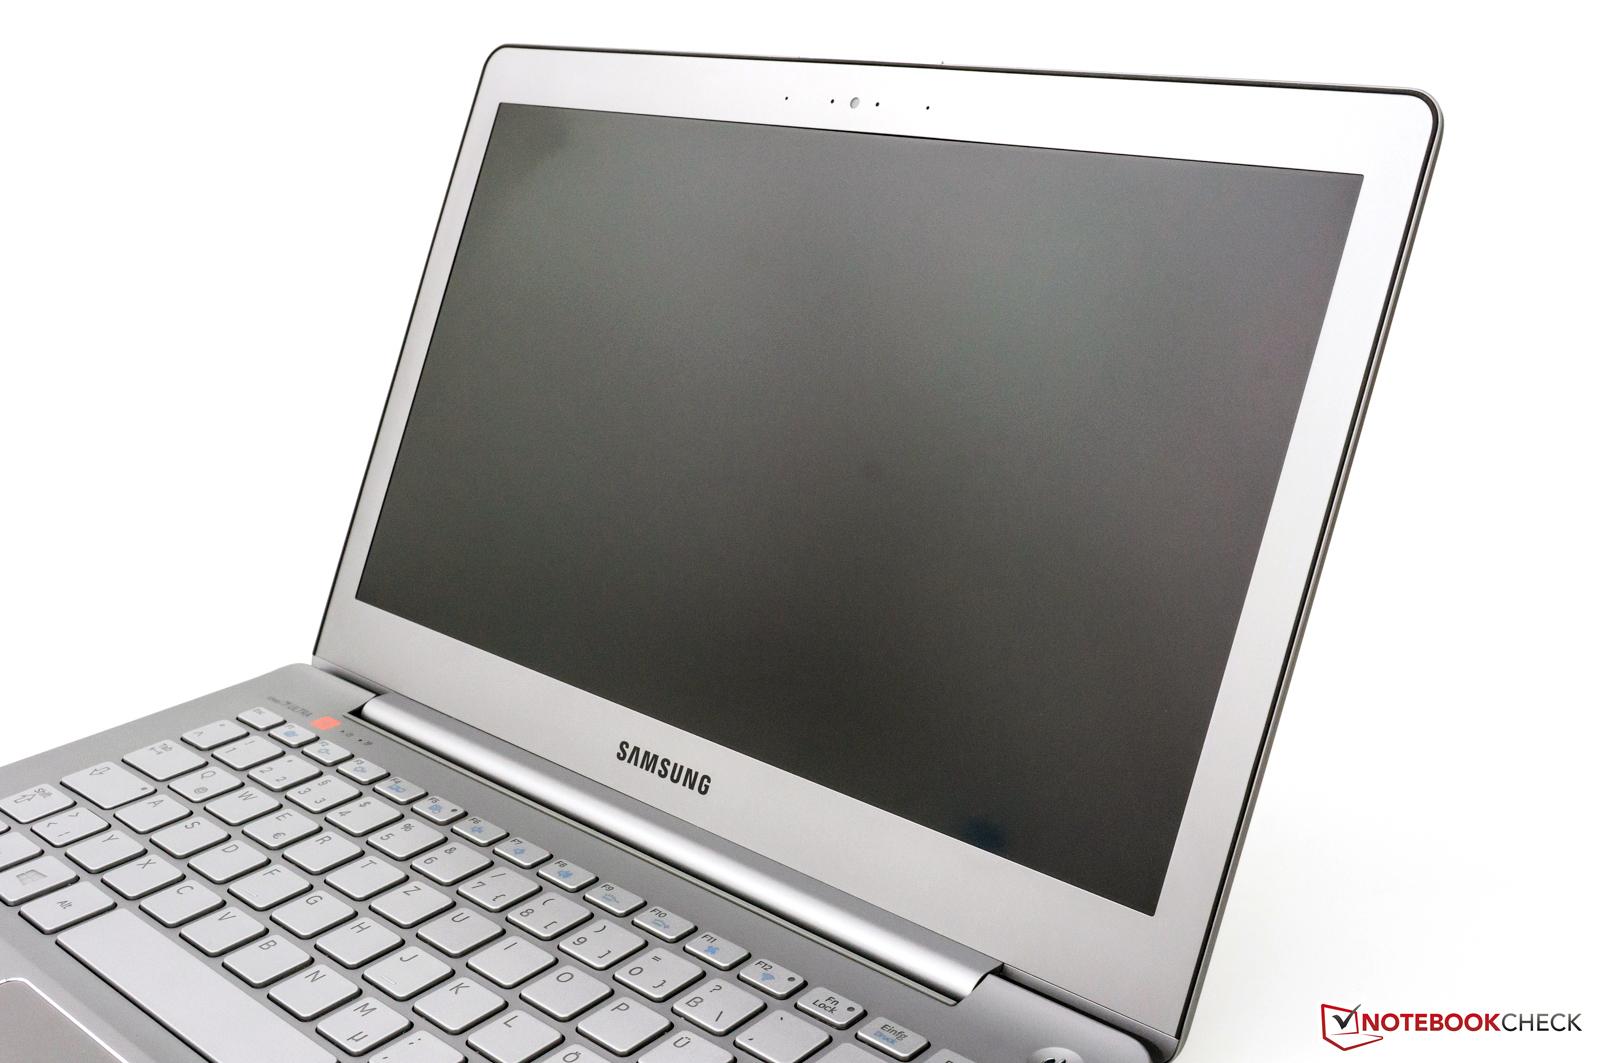 Notebook samsung kualitas - Matte Full Hd Ips Screen With 1920x1080 Pixels